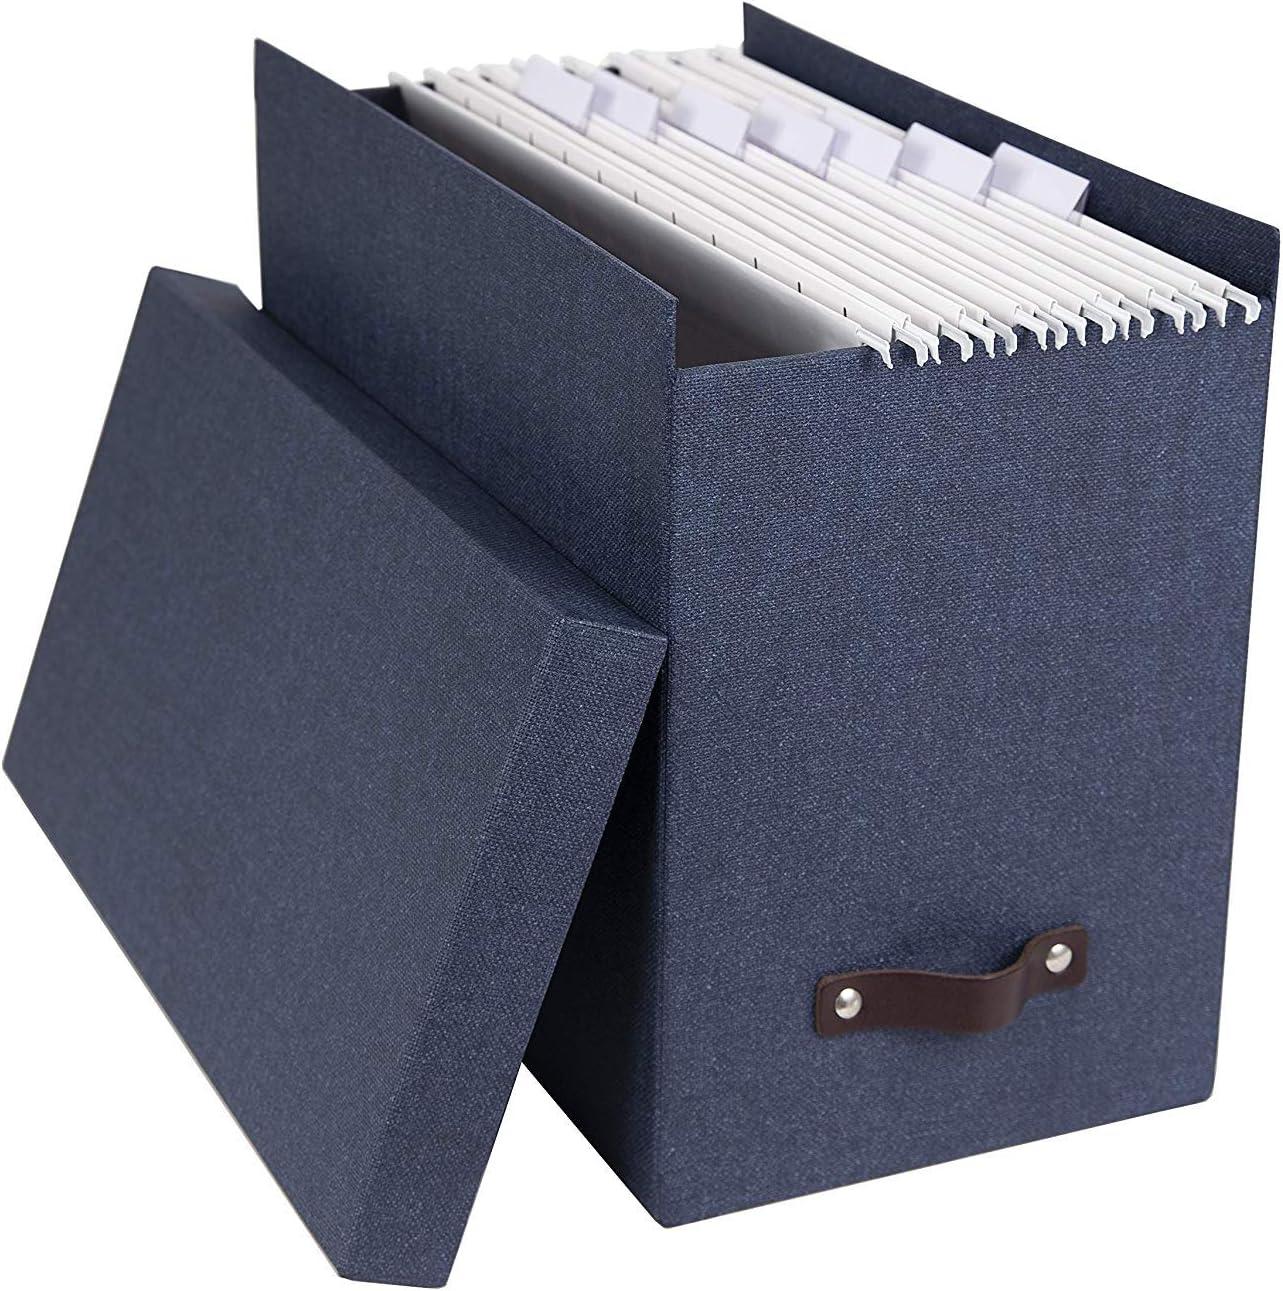 Bigso Box of Sweden 9441/C3843/Puerta Respaldo Tablero de Fibra Azul 35/x 18,5/x 27/cm